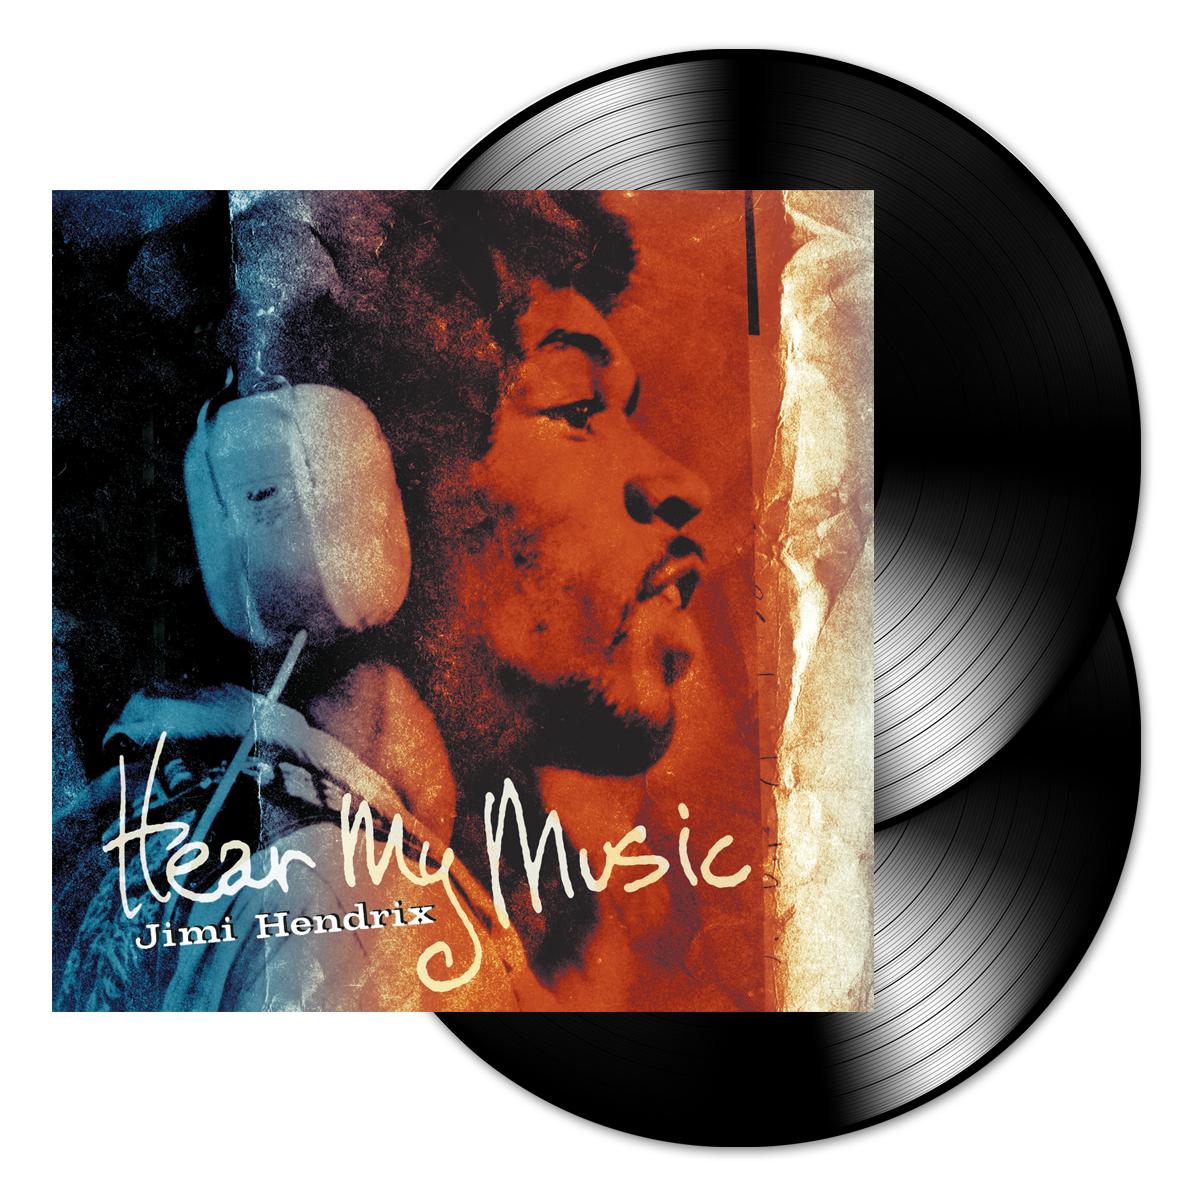 Jimi Hendrix: Hear My Music 2 Disc LP